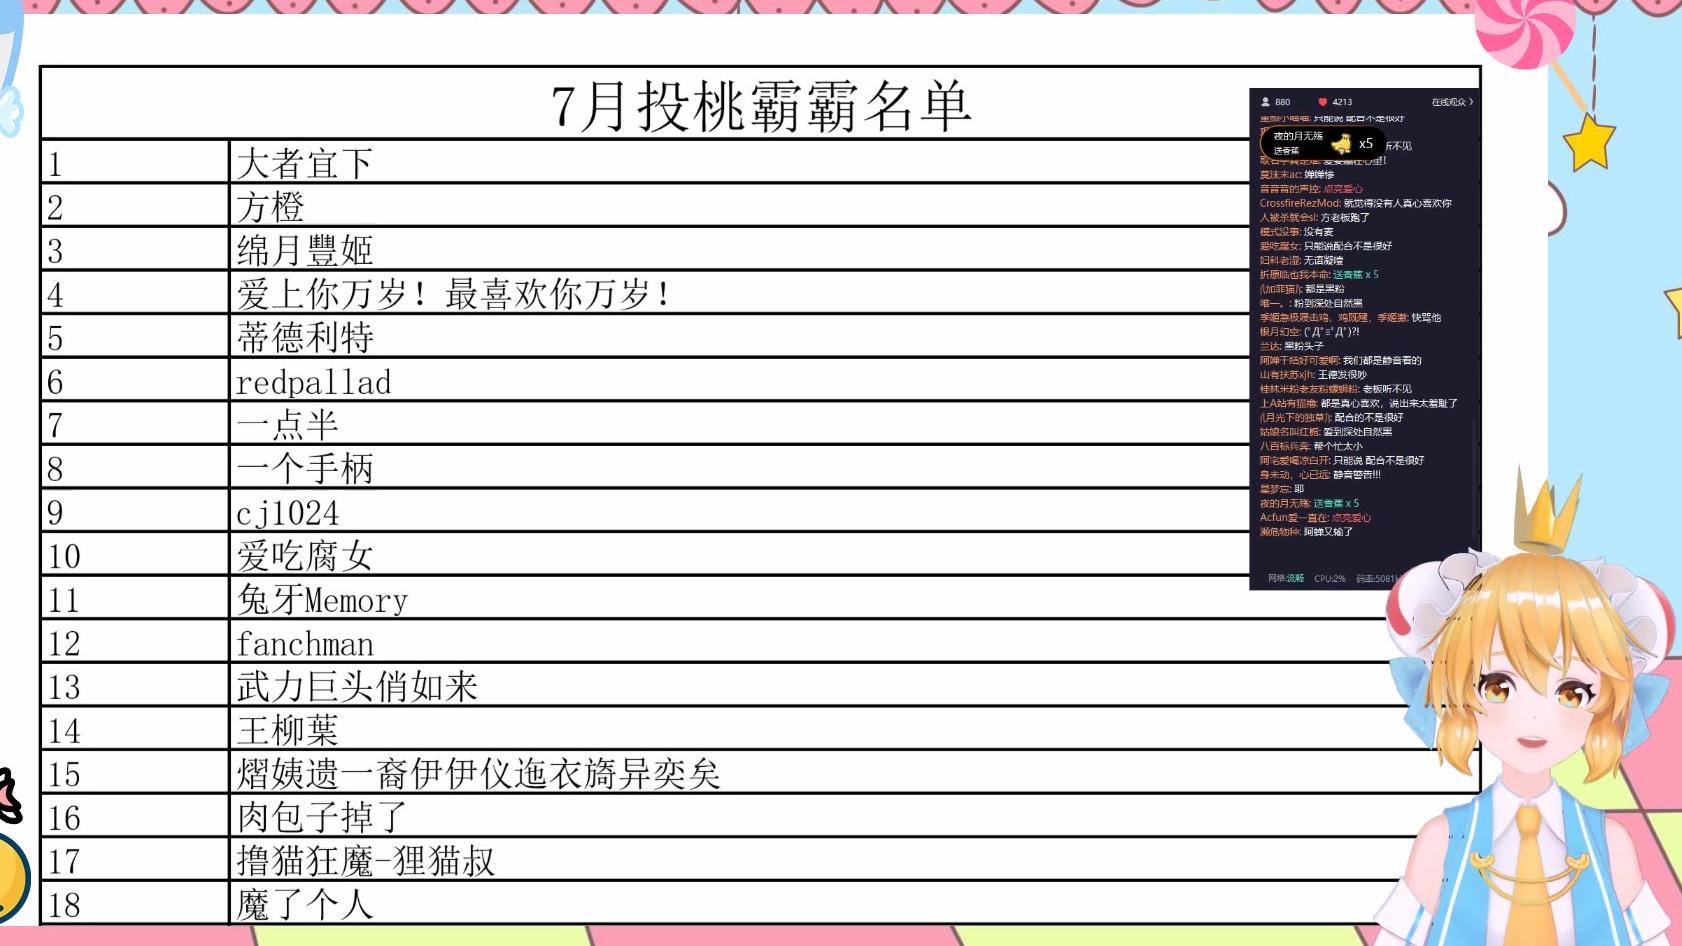 【AC娘】LIVE!炎炎夏日挡不住灼热的谢霸霸之心!